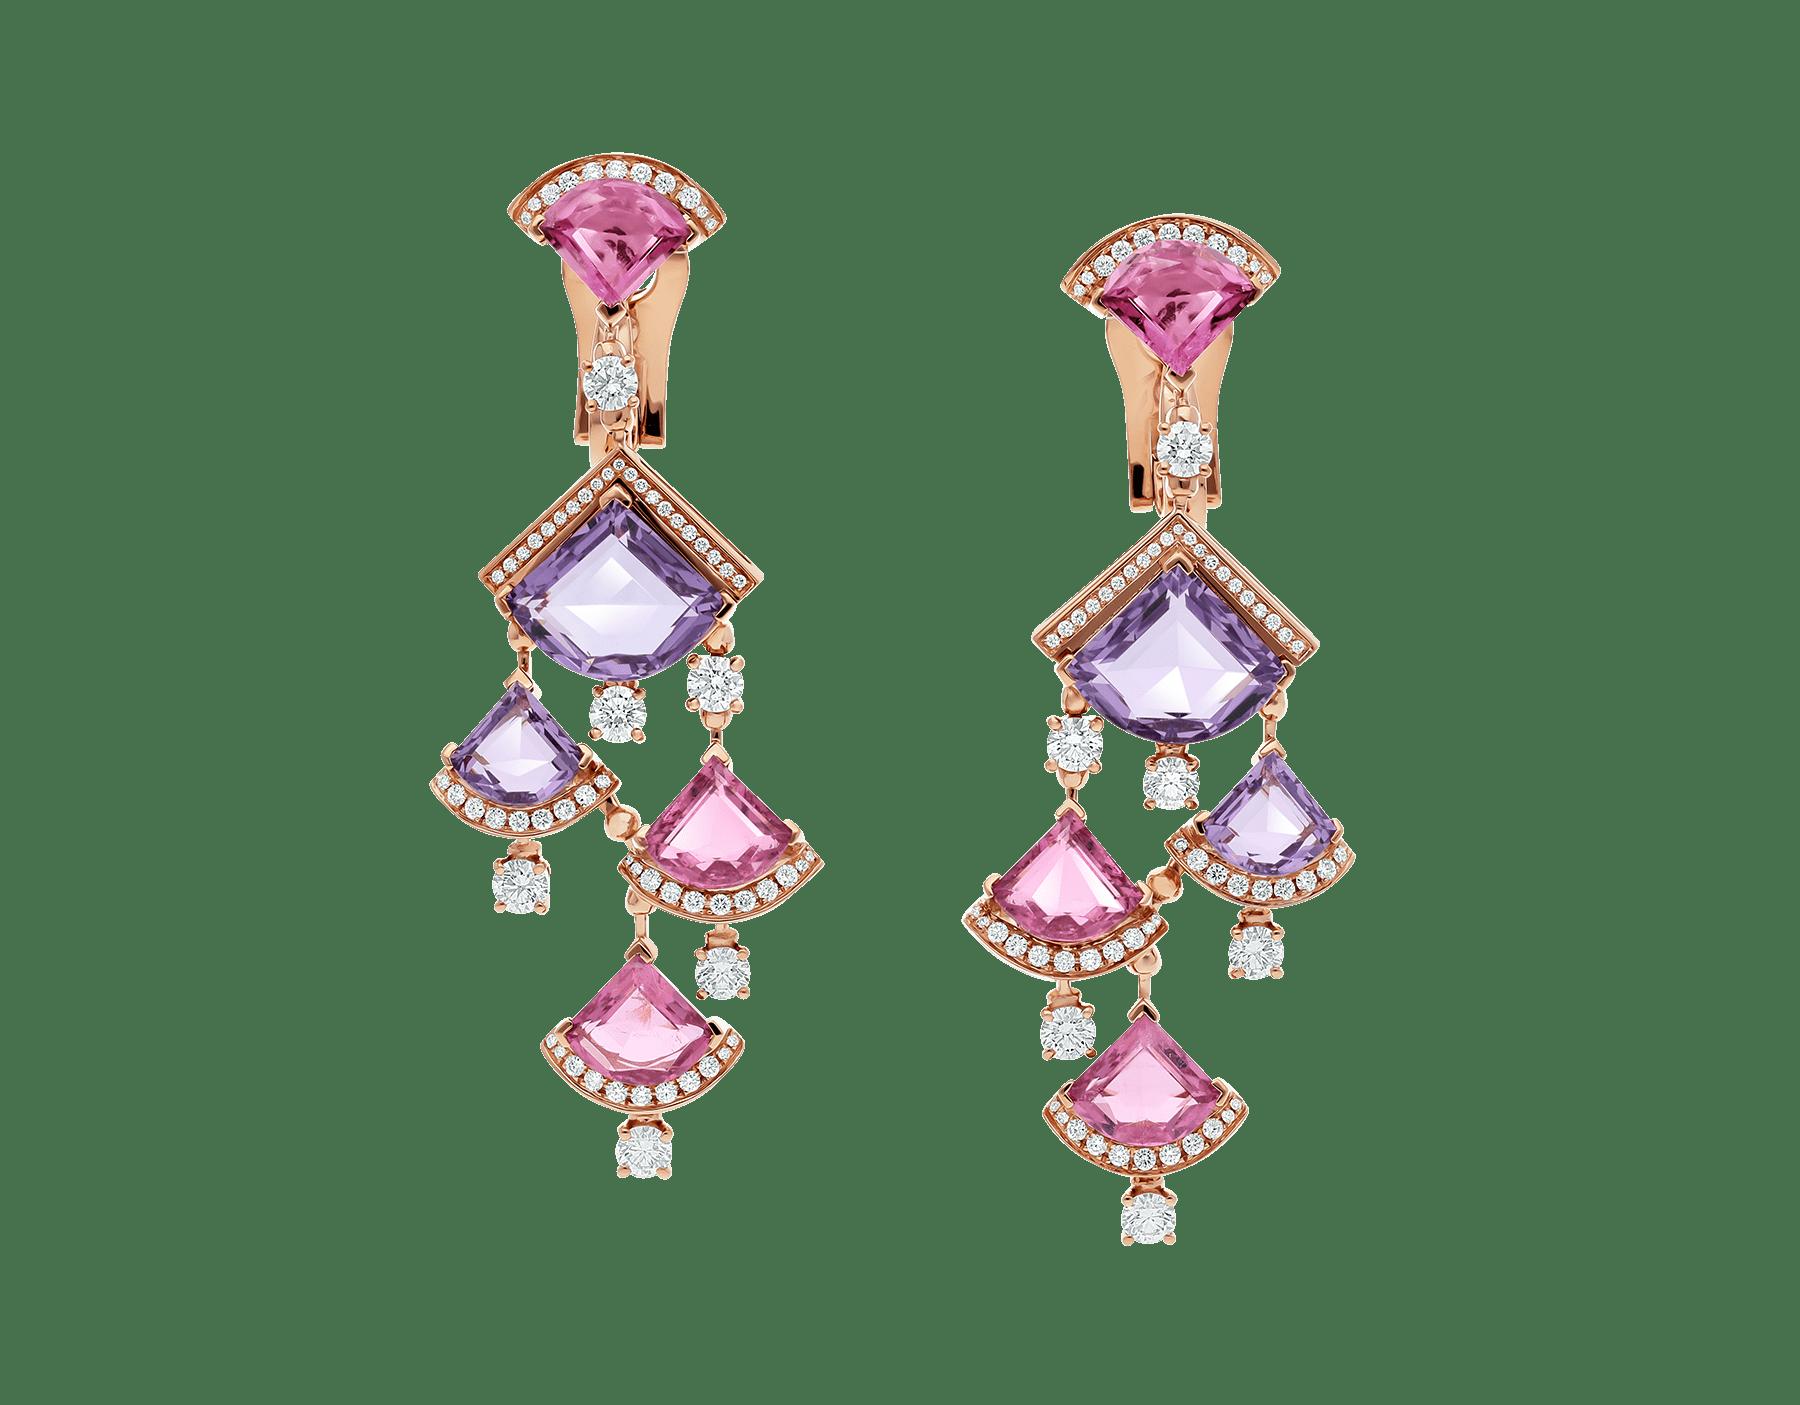 DIVAS' DREAM 18K 玫瑰金耳環,鑲飾粉紅色紅碧璽、紫水晶和密鑲鑽石。 354078 image 1